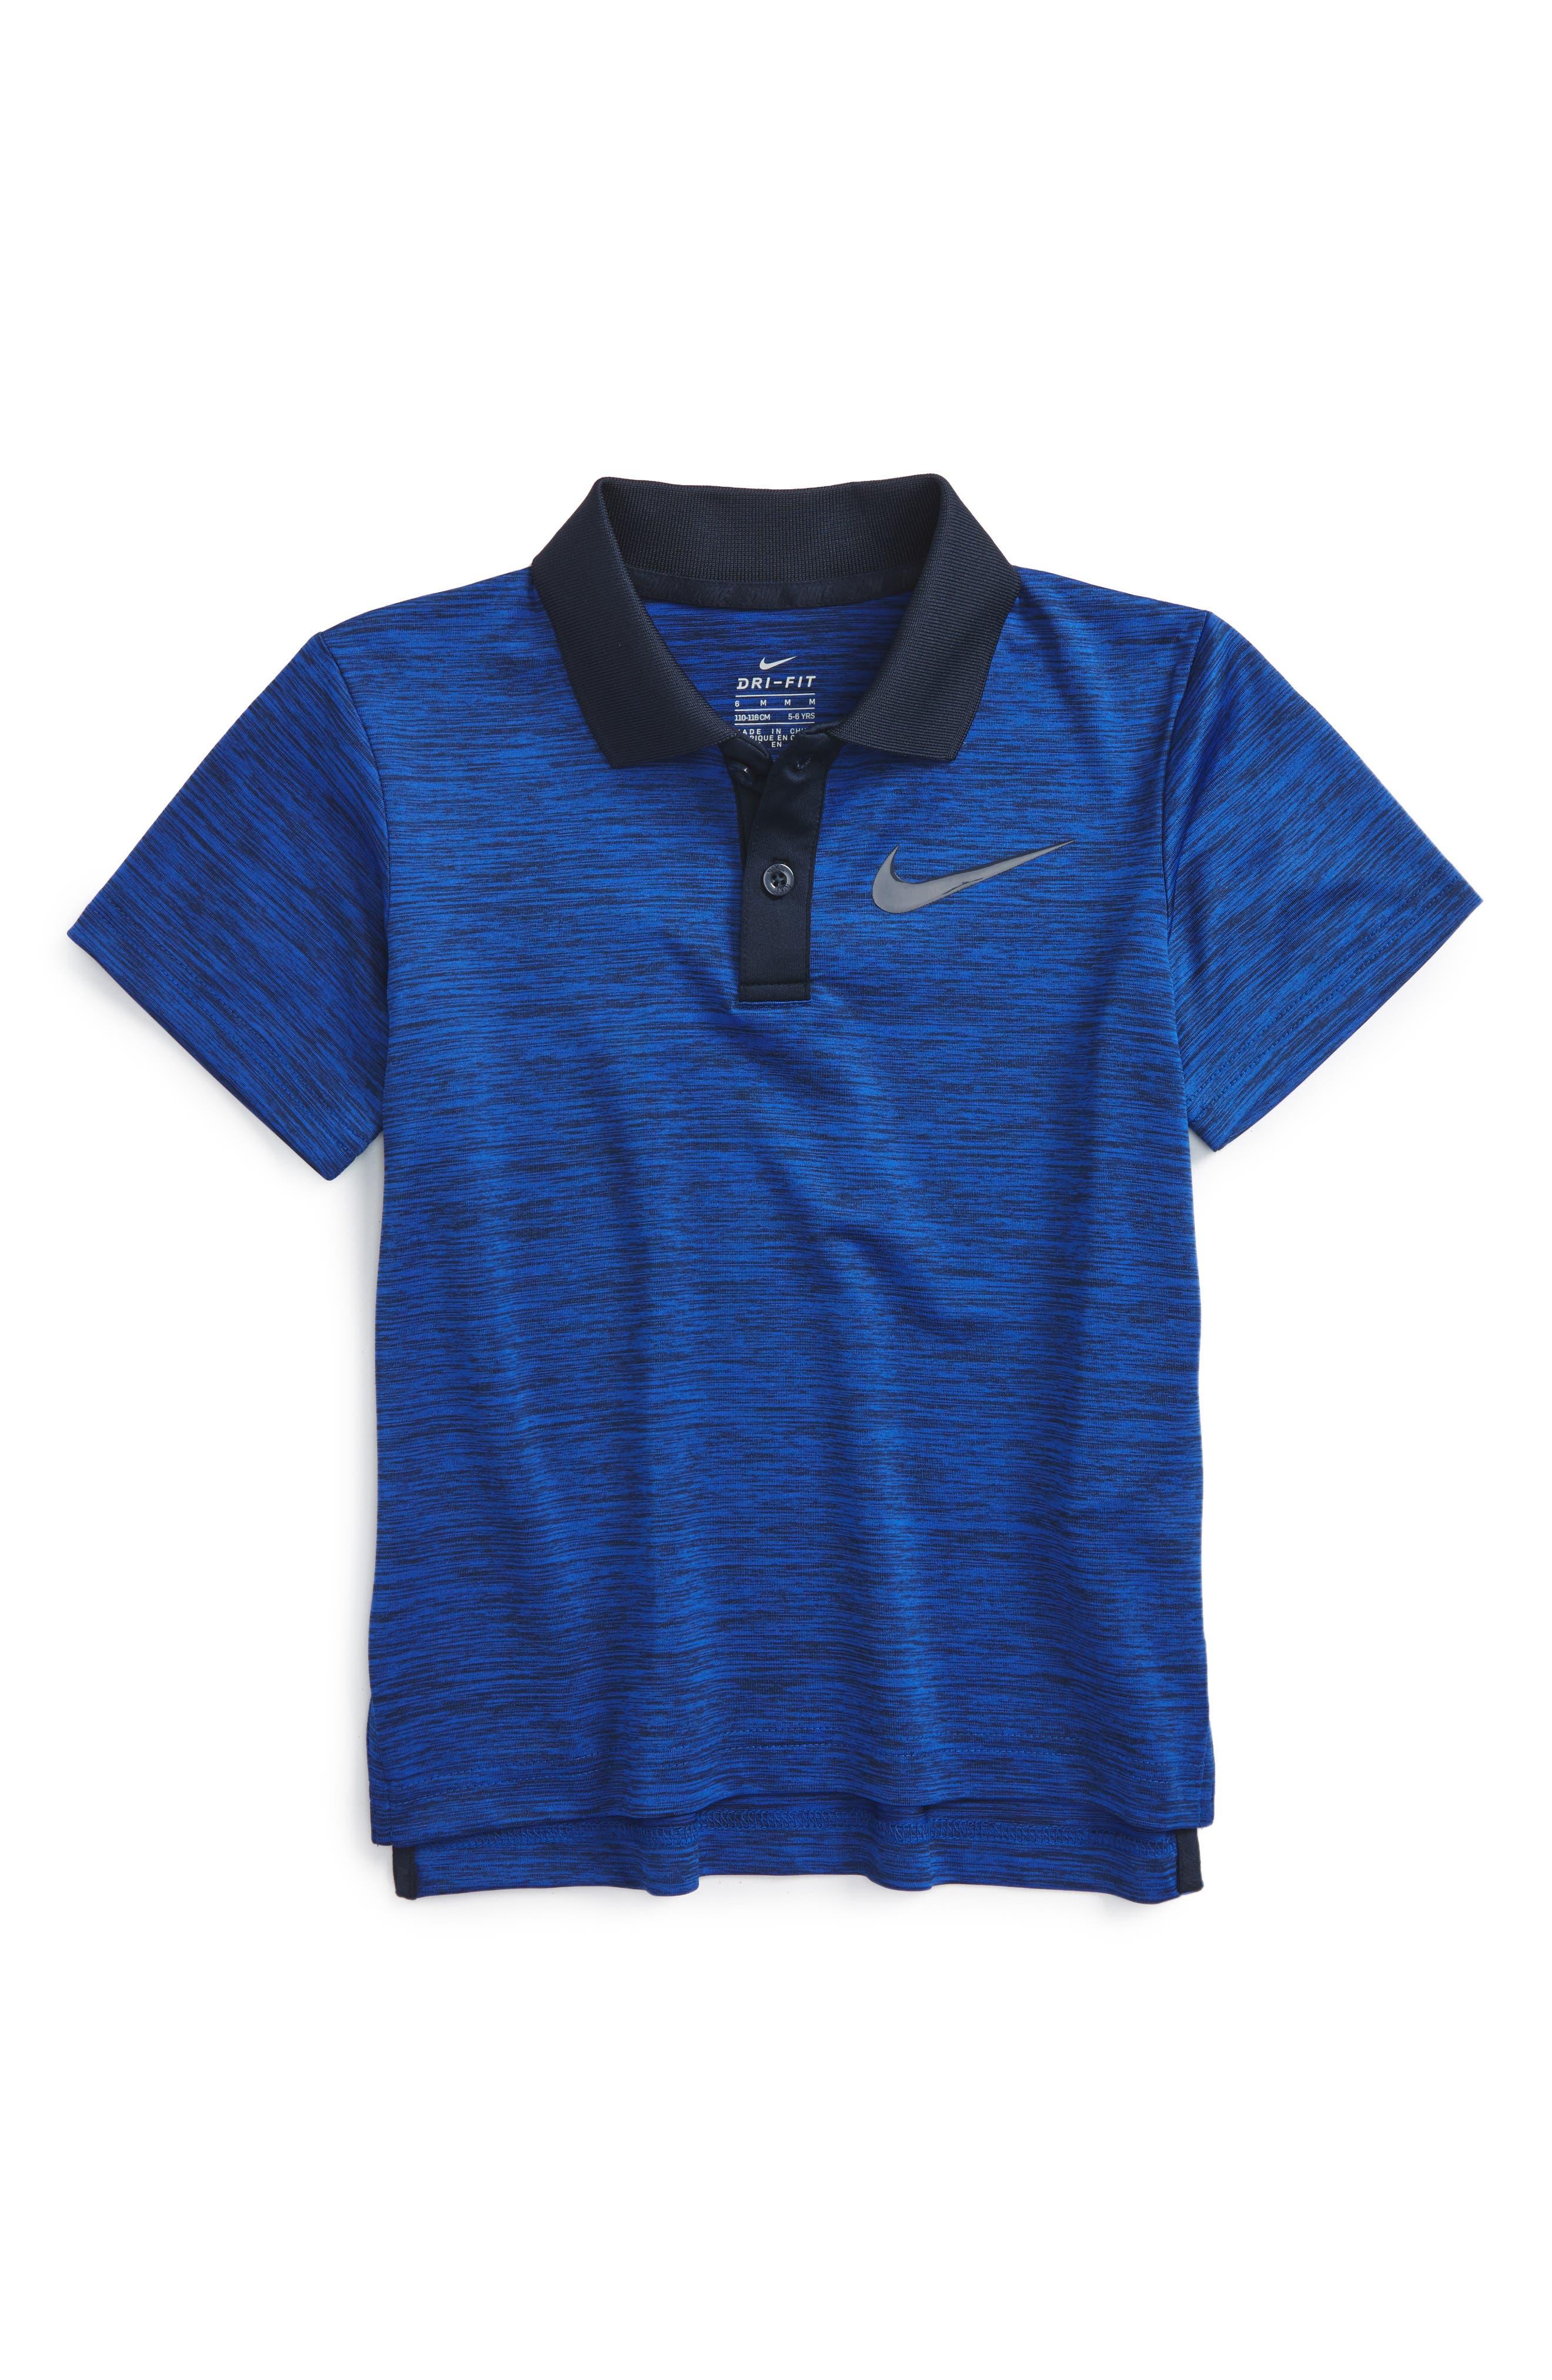 Main Image - Nike Dri-FIT Polo (Toddler Boys & Little Boys)